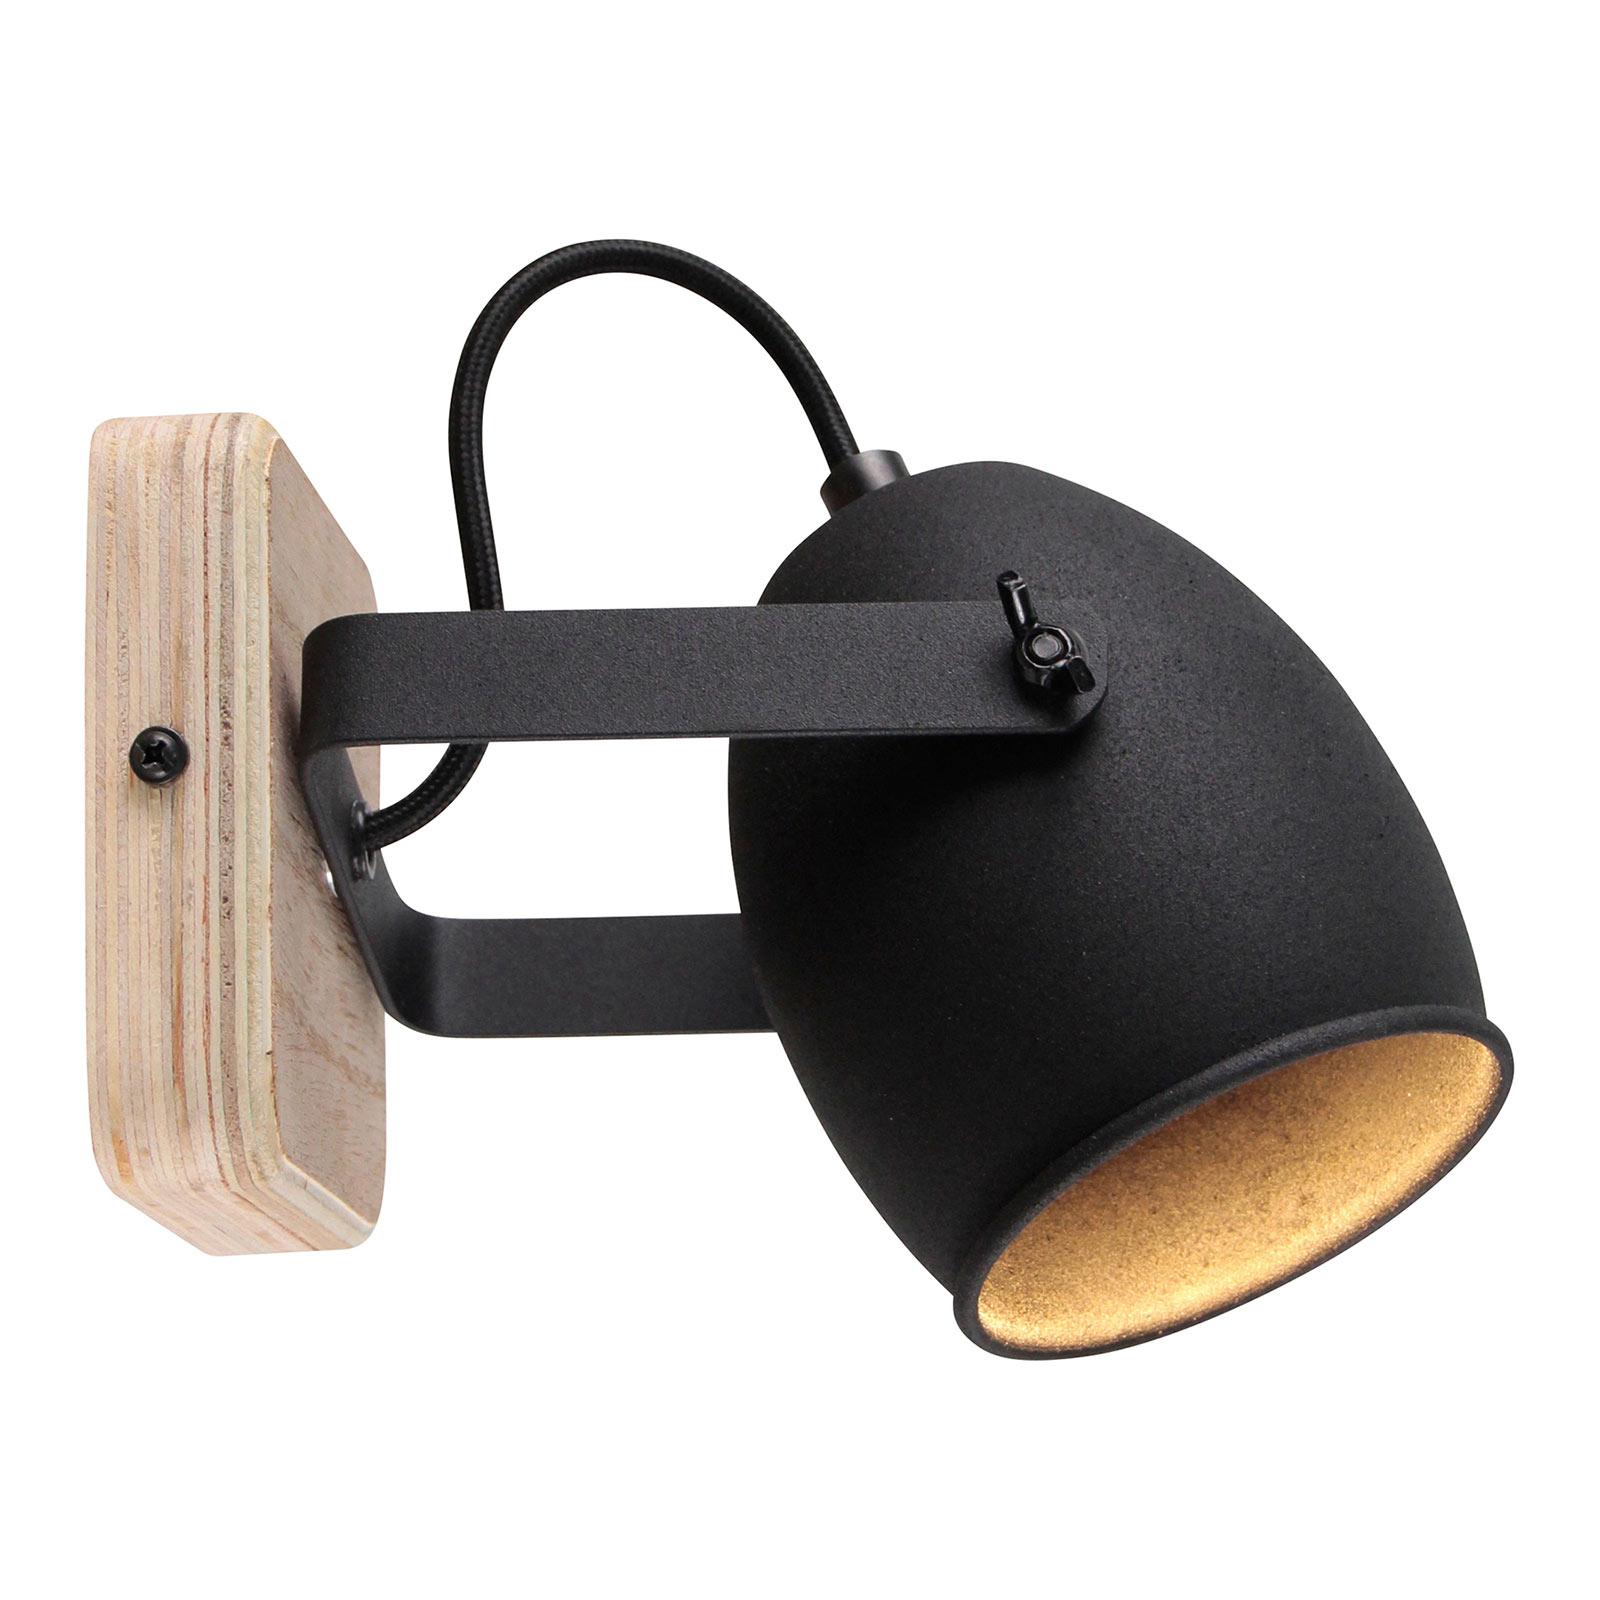 Vegglampe Crowton, svingbart hode